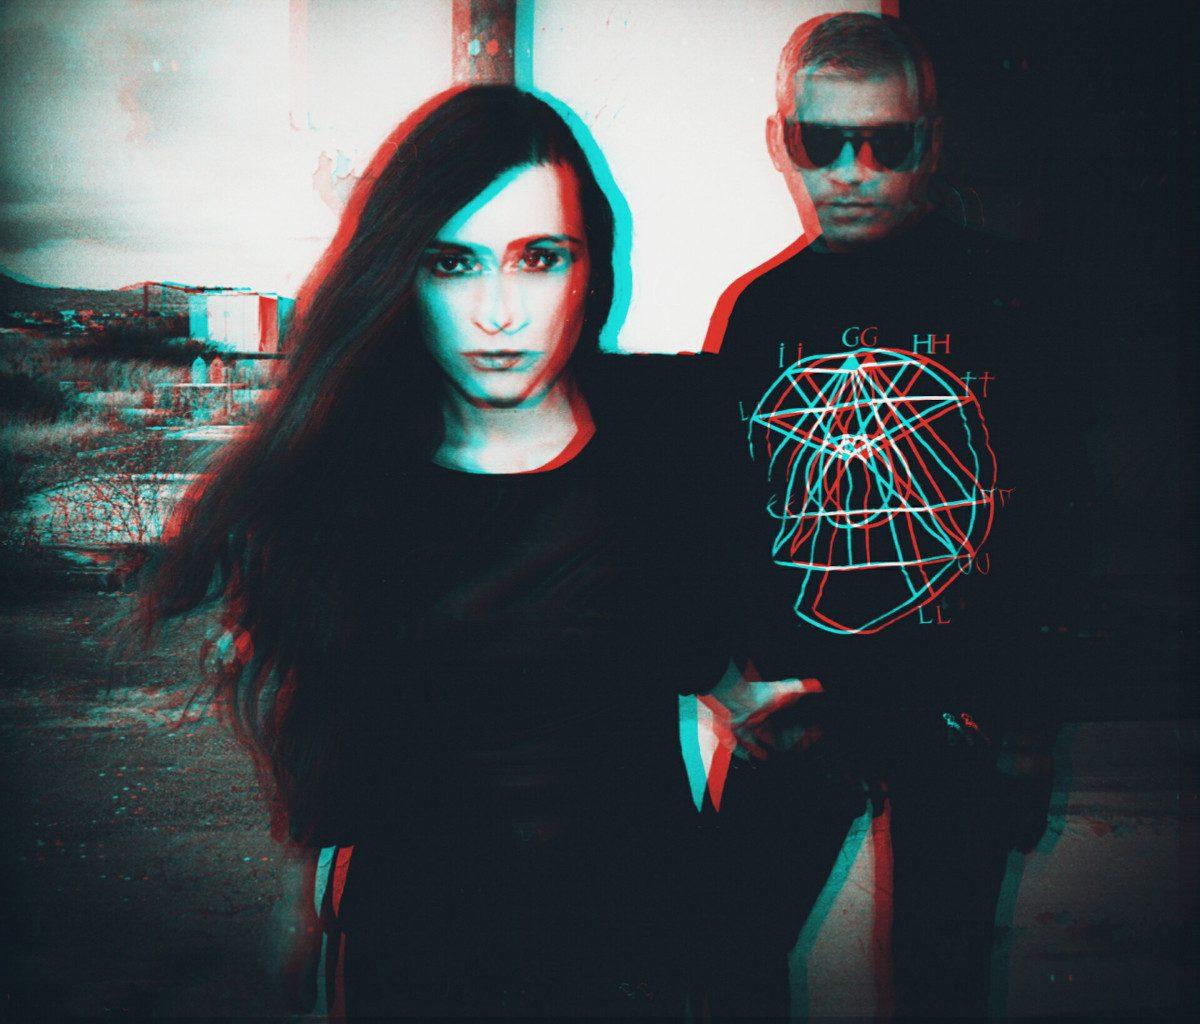 Paradox Obscur to release Metropolis debut 'Singles & Rarities'